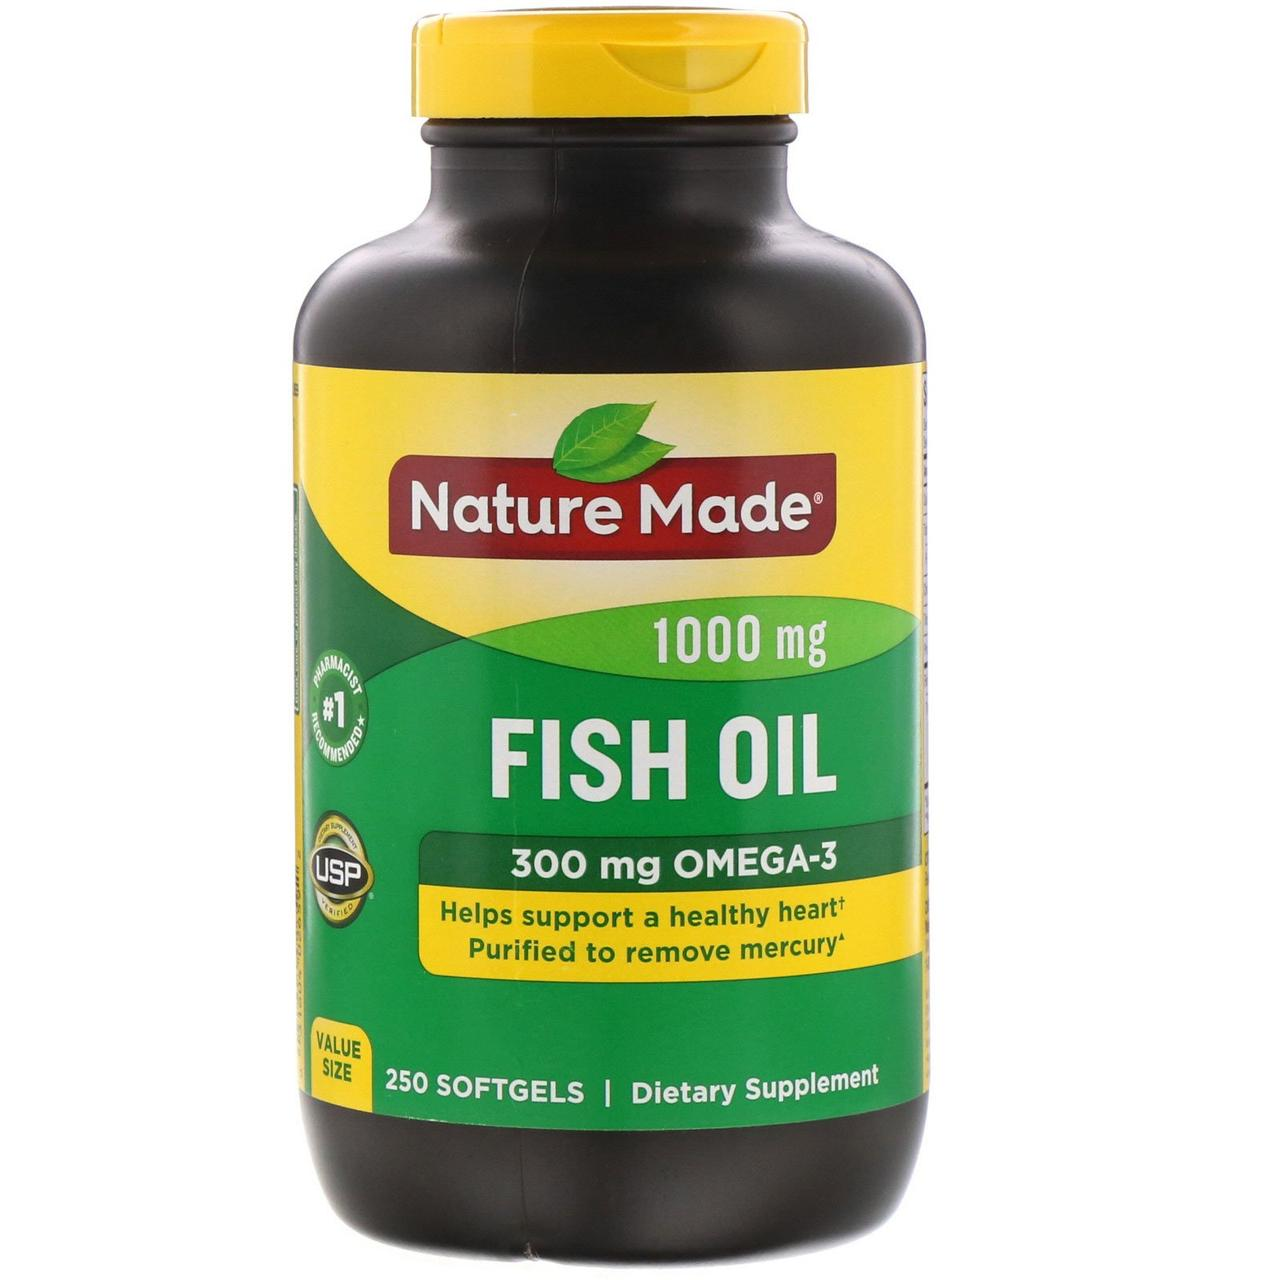 Риб'ячий жир, Омега 3, Fish Oil, Omega-3, Nature Made, 1000 мг, 250 капсул